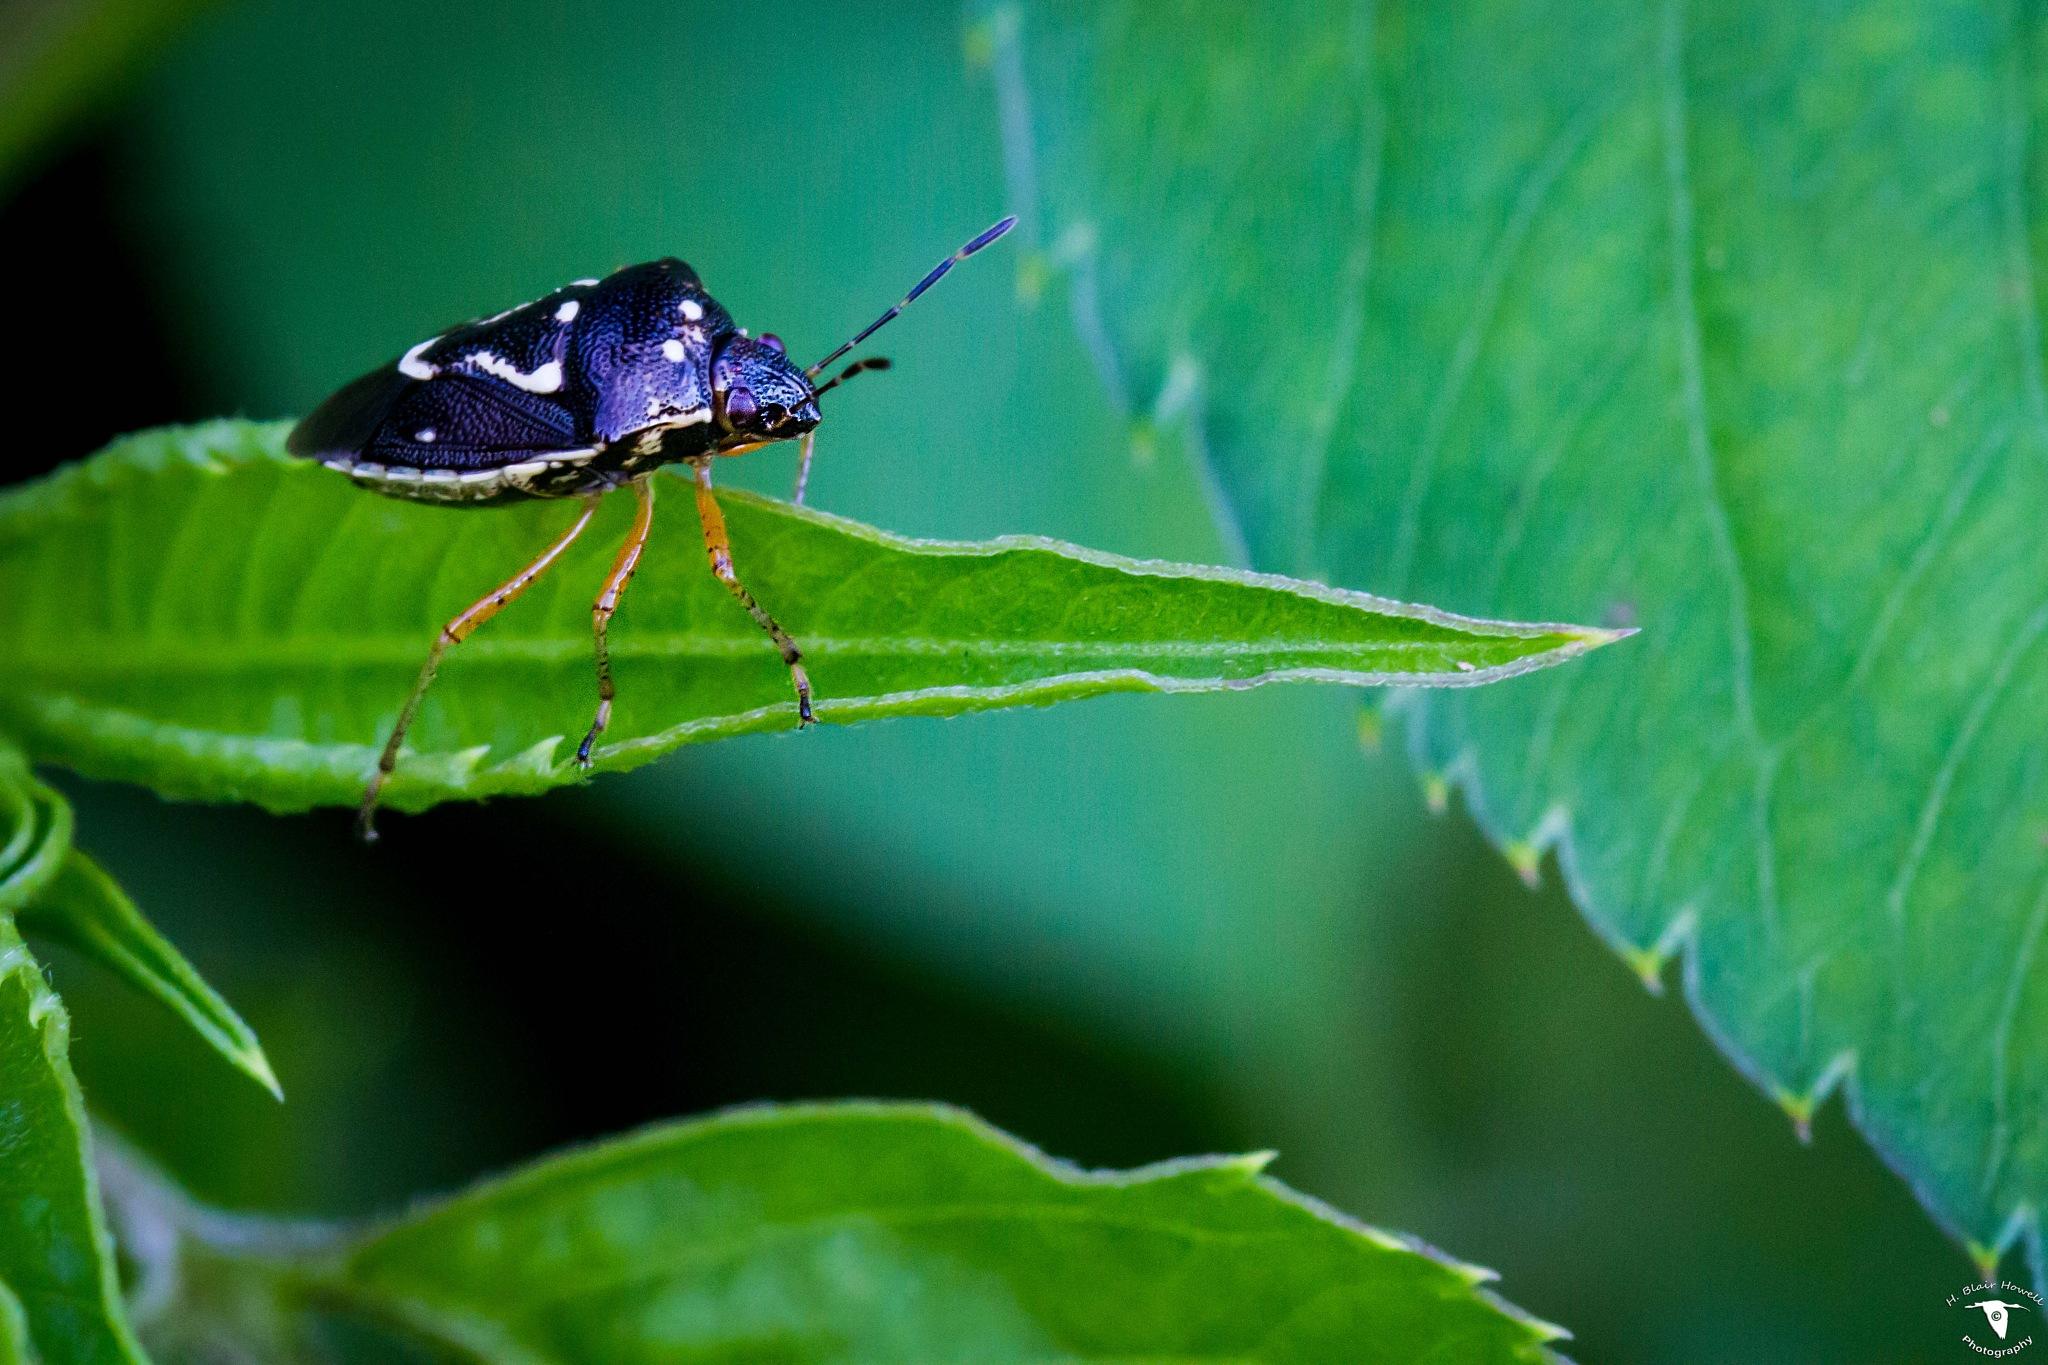 Stink Bug by HBlairHowell